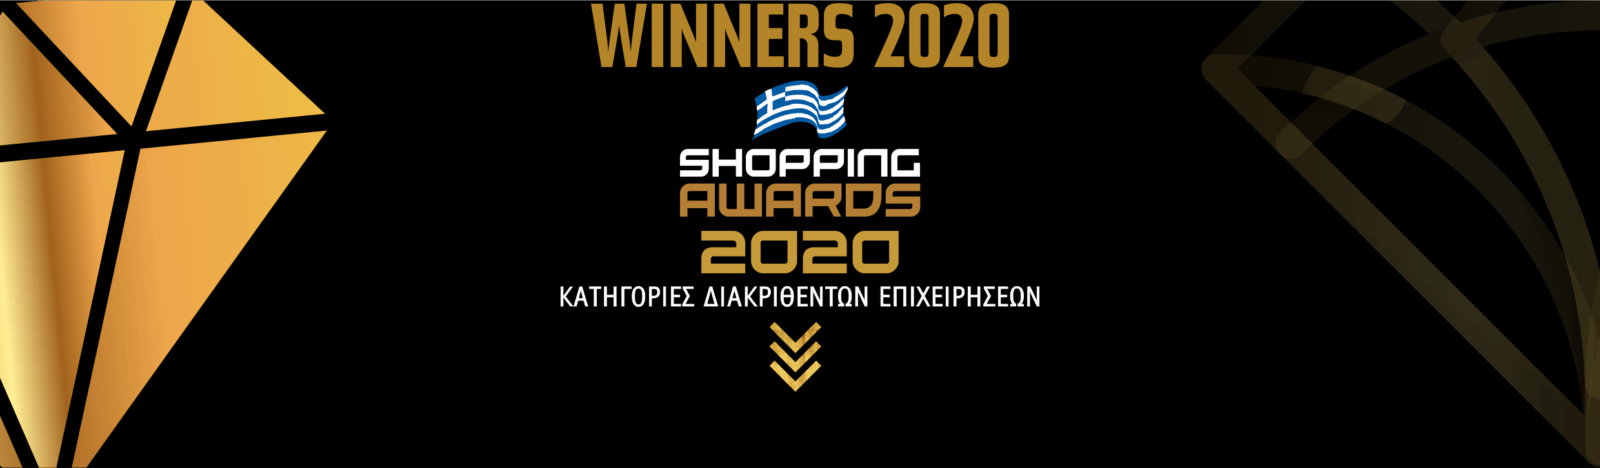 shopping_awards_2020